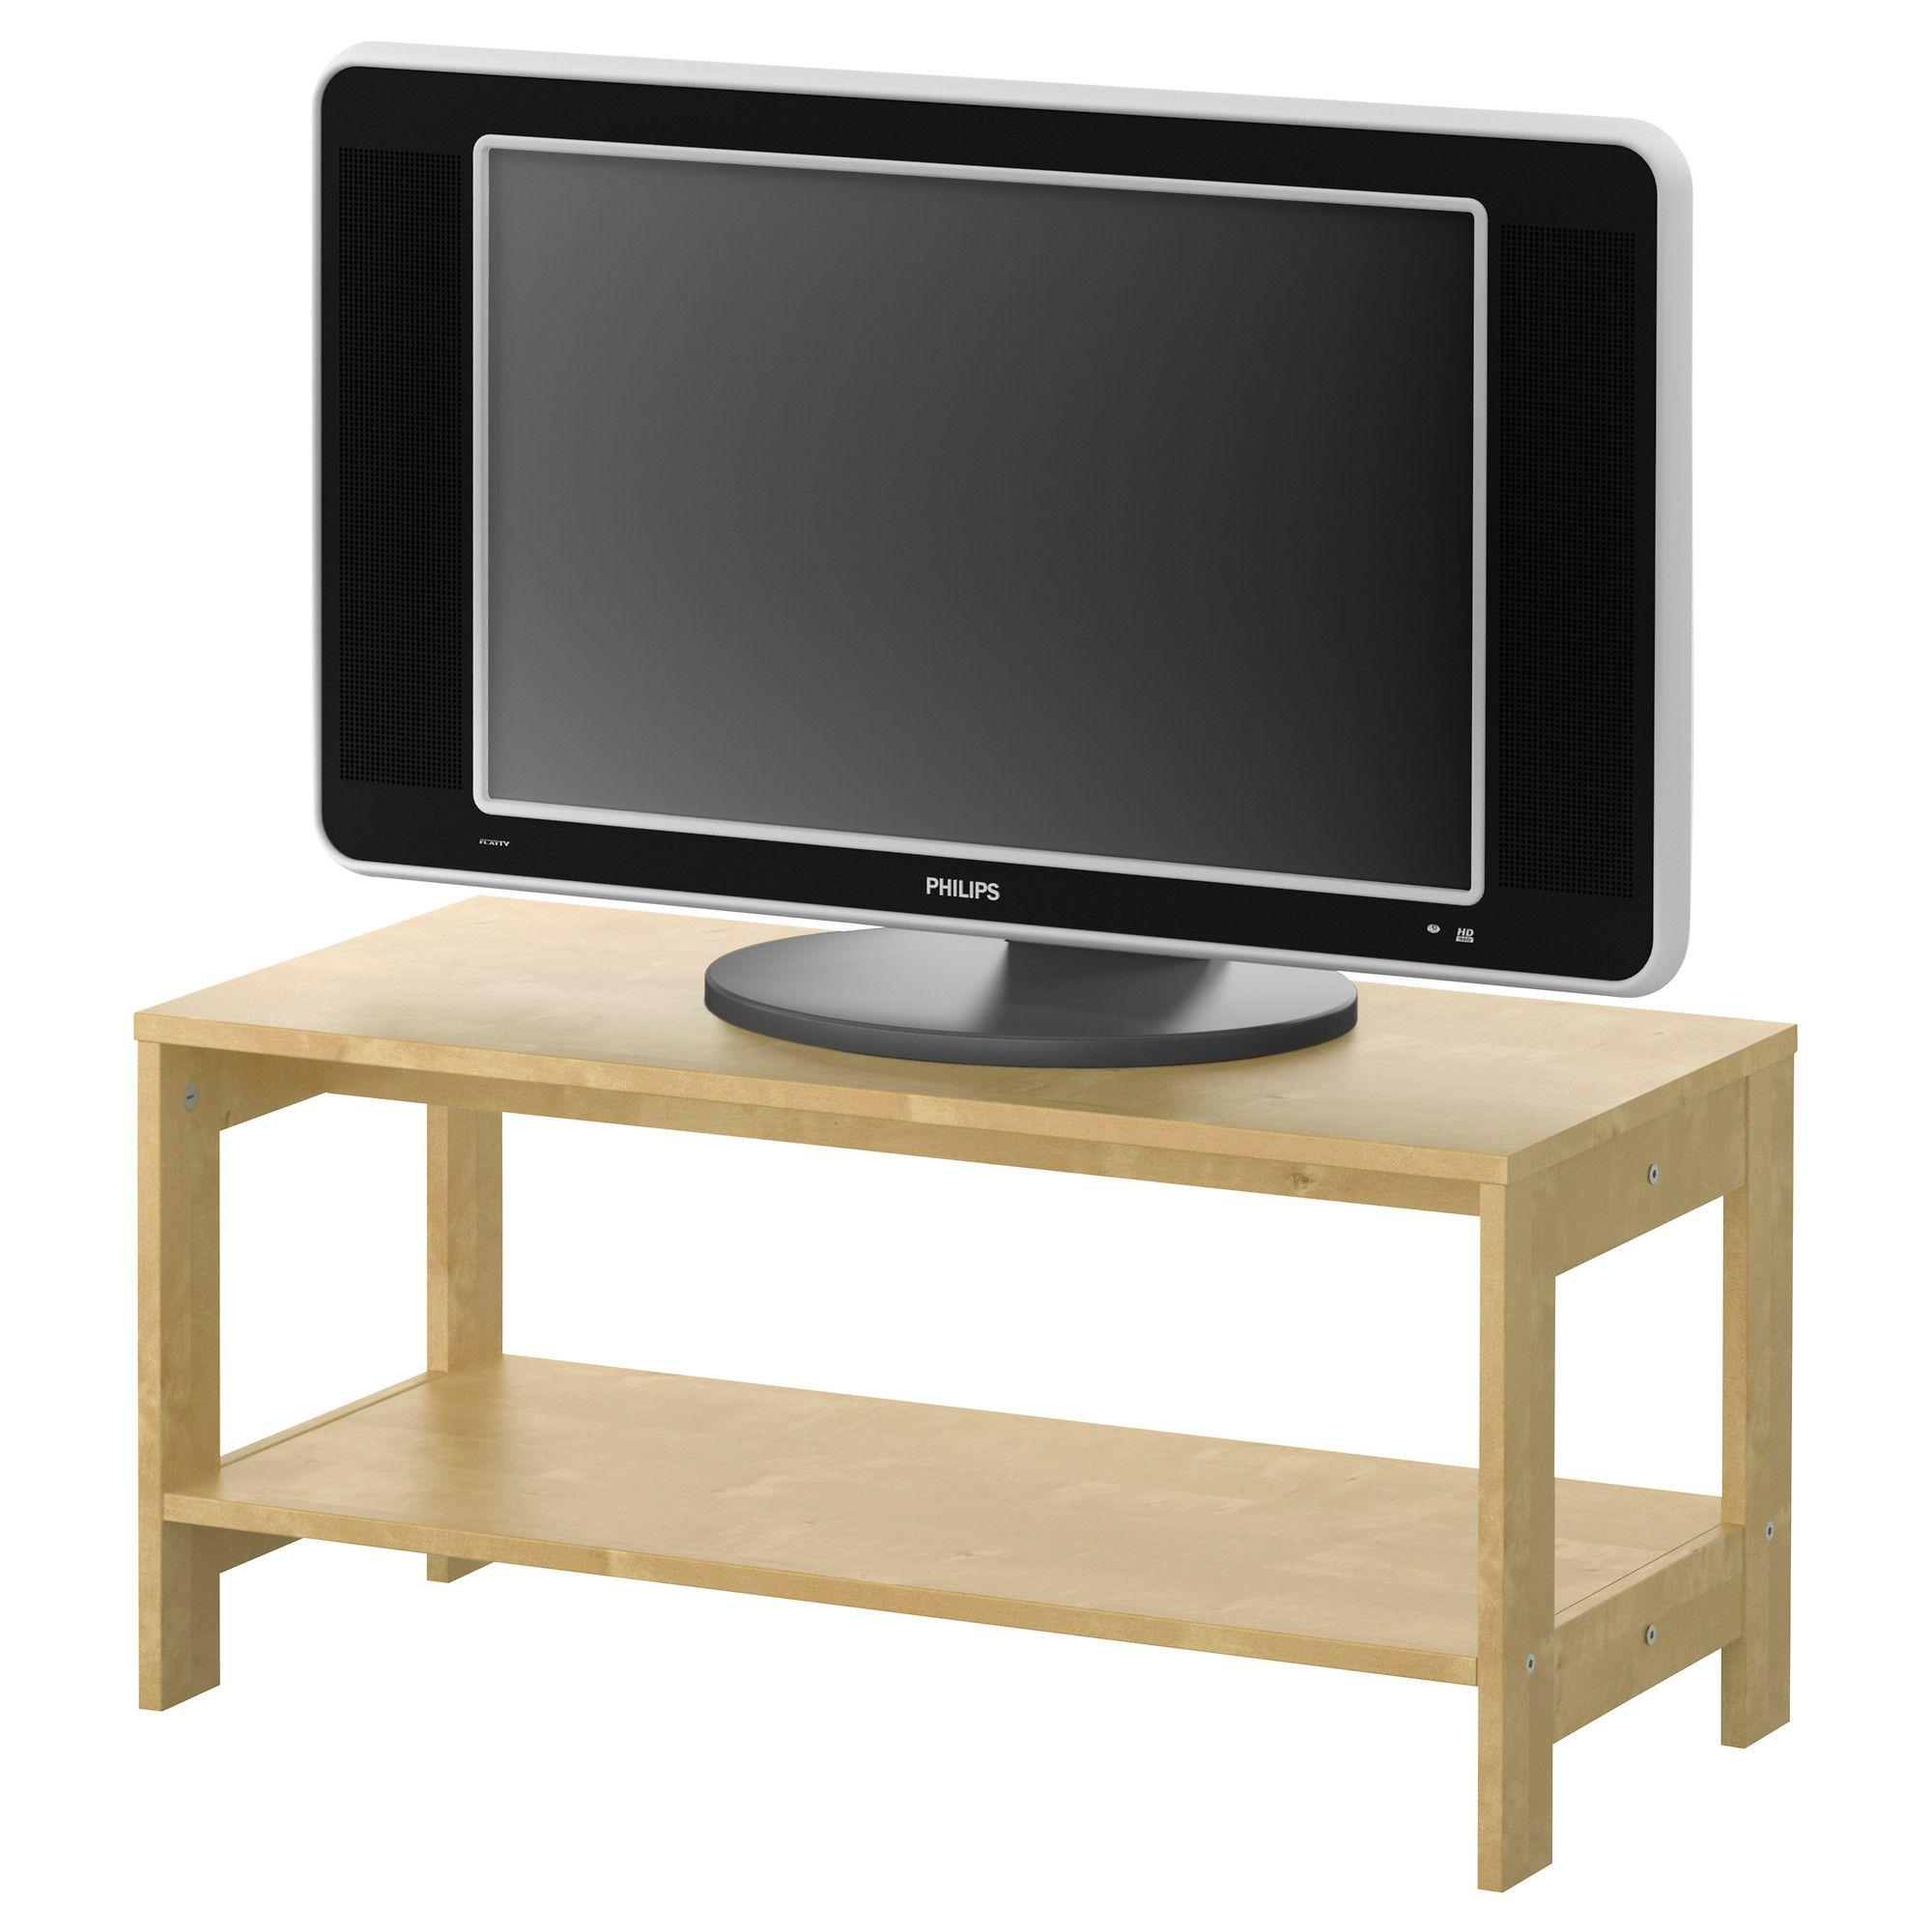 Laiva Tv Bench Ikea Interessante Pinterest Tv Bench Bench  # Grevback Ikea Banc Tv Dimensions